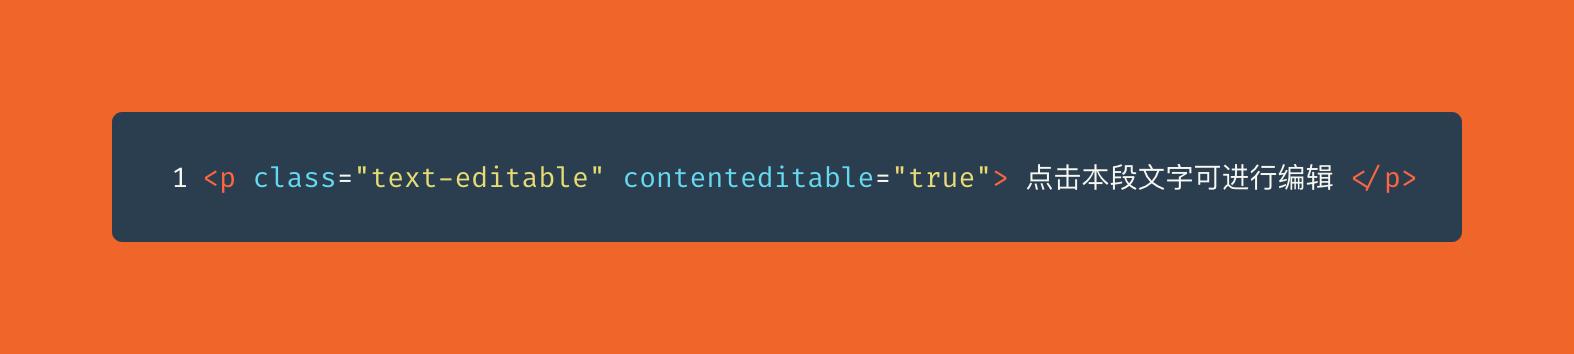 HTML — 让用户也可以编辑✏️页面📄️内容